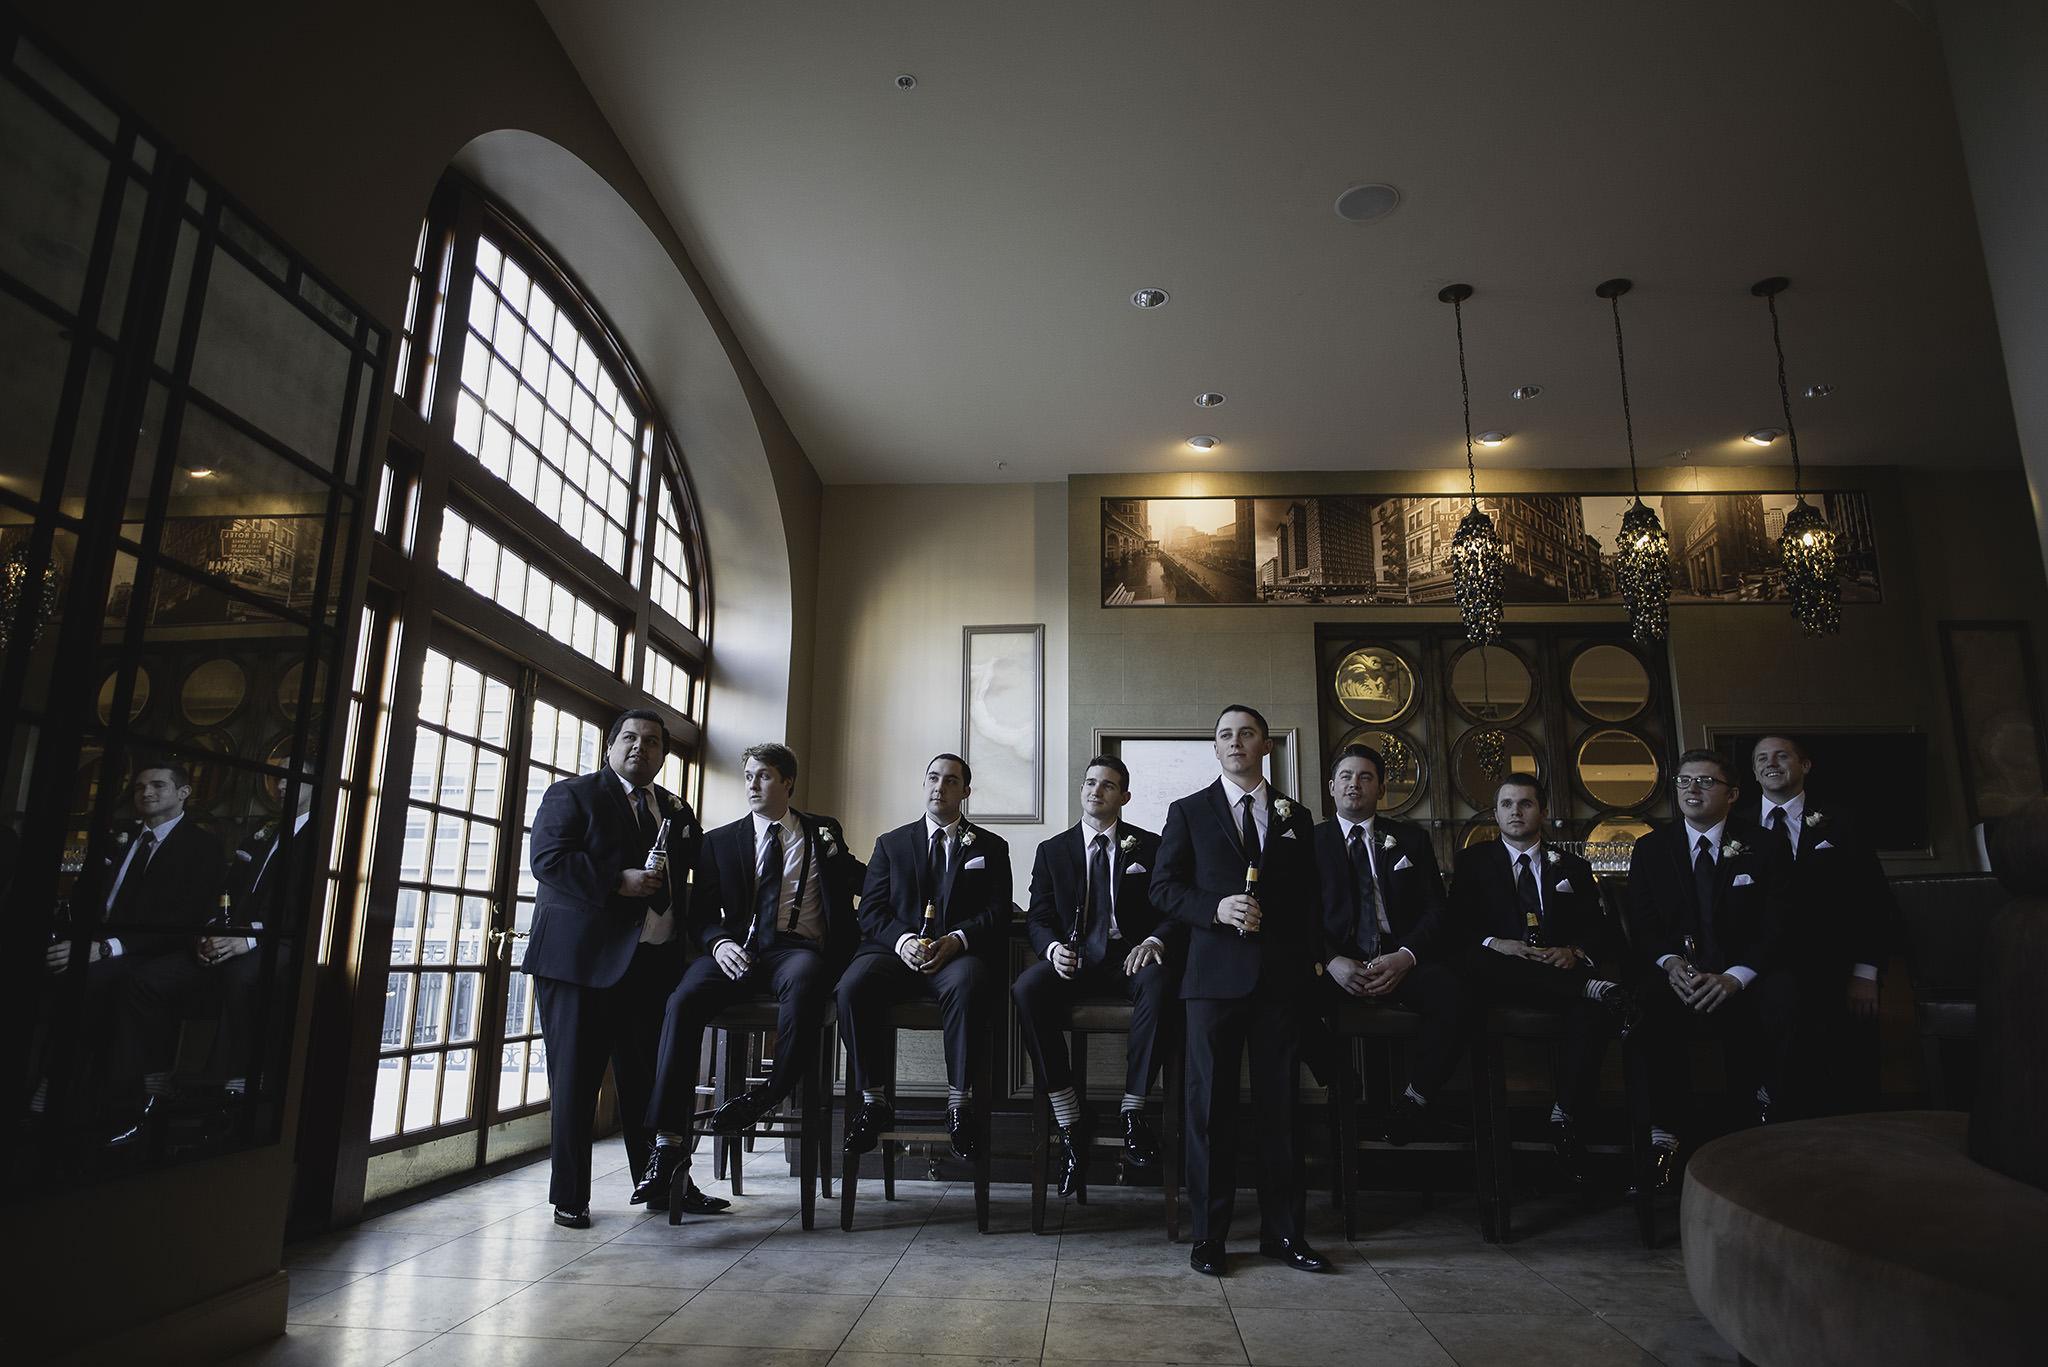 Claire-Travis-Classy-artistic-Downtown-Houston-Rice-ballroom-wedding-sm-006.jpg